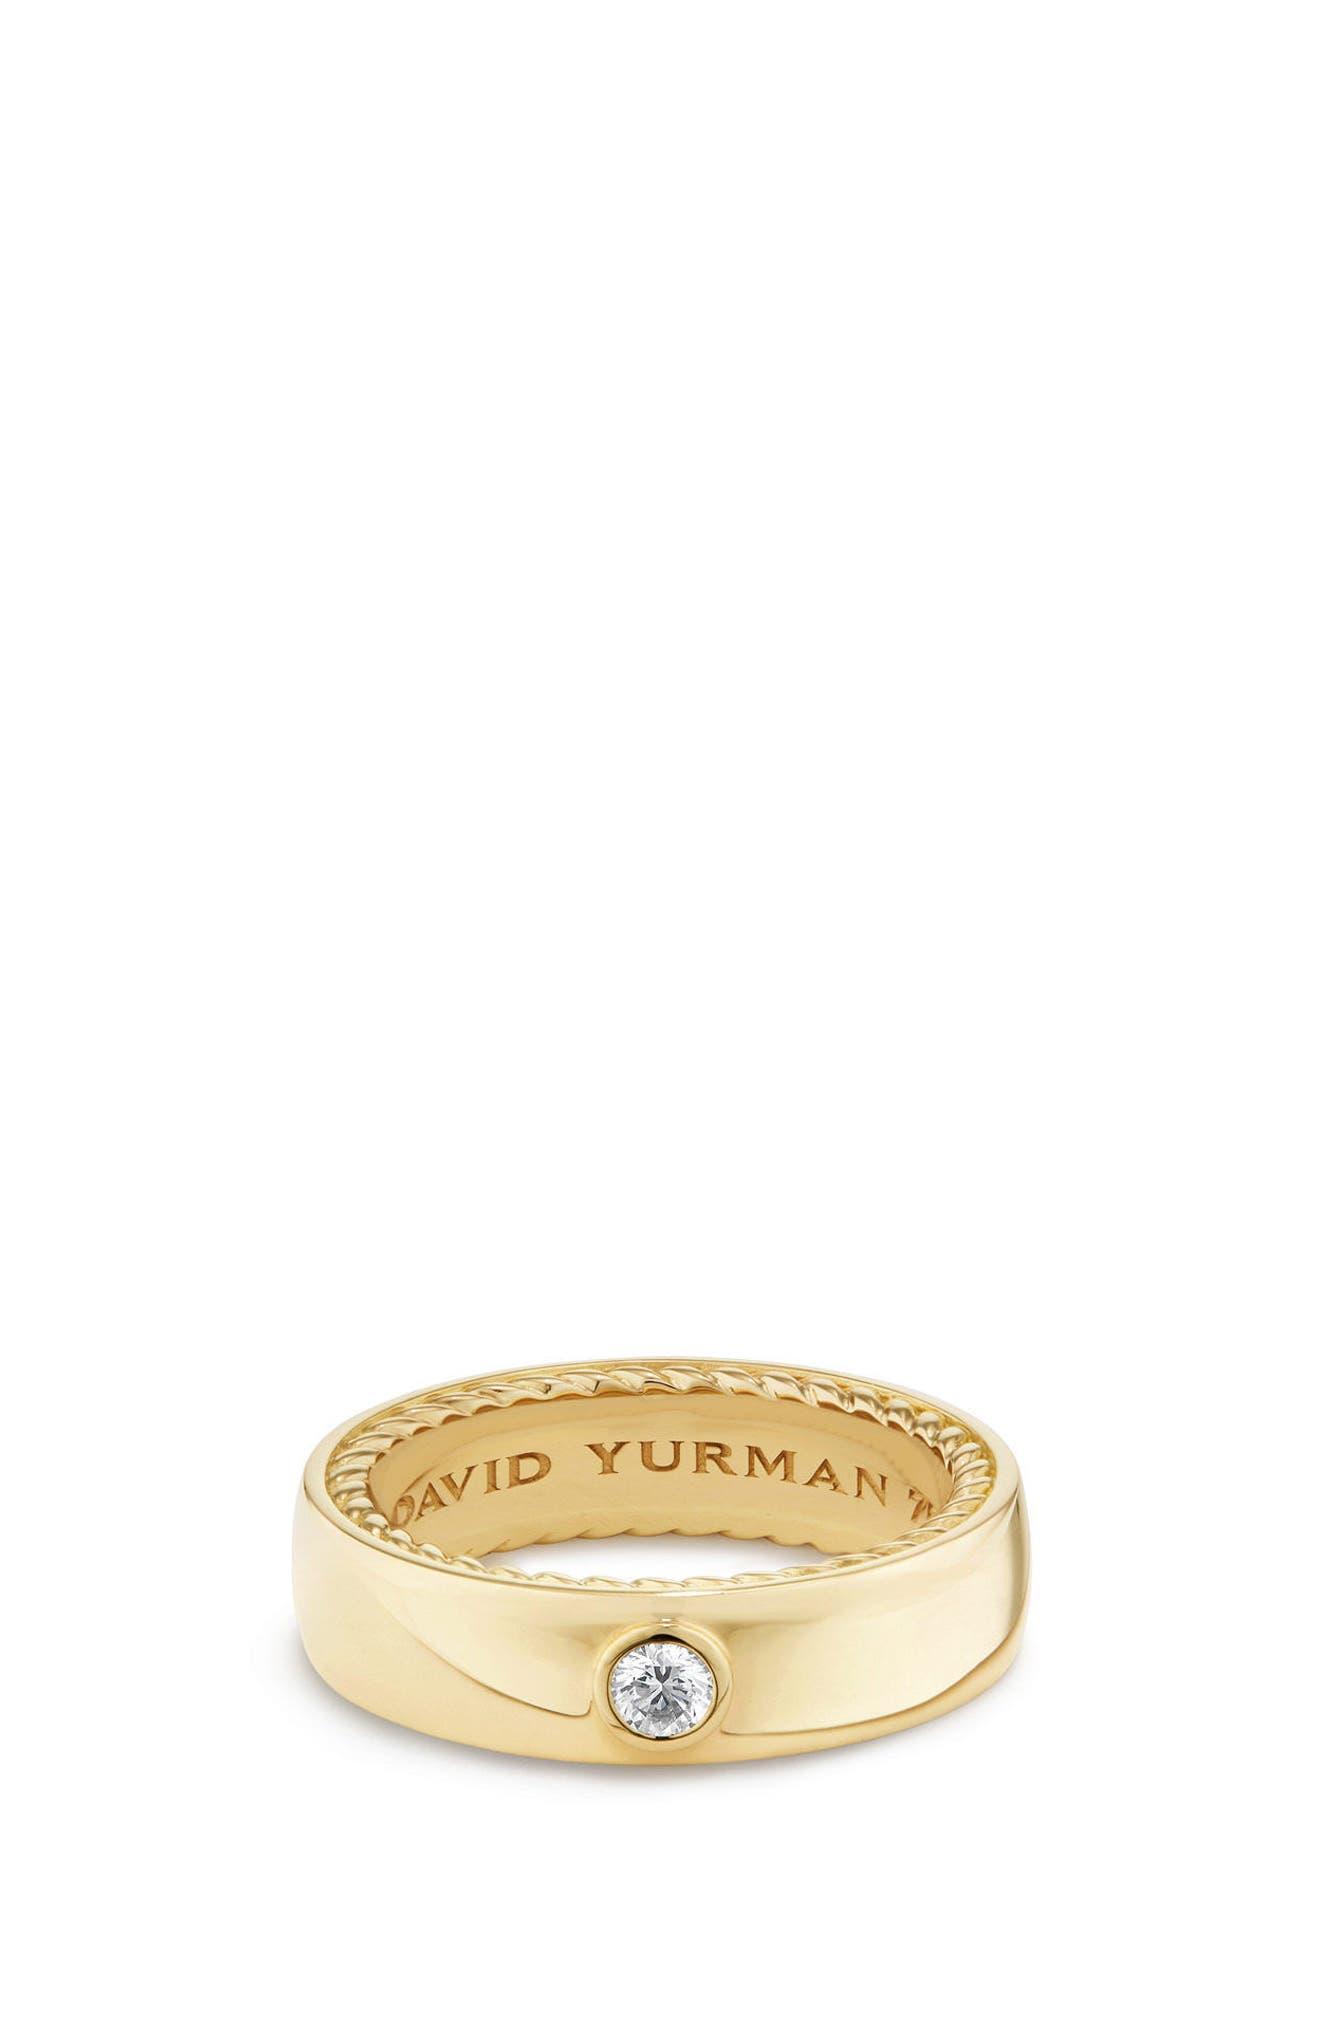 David Yurman Streamline Band Ring with Diamond, 6mm